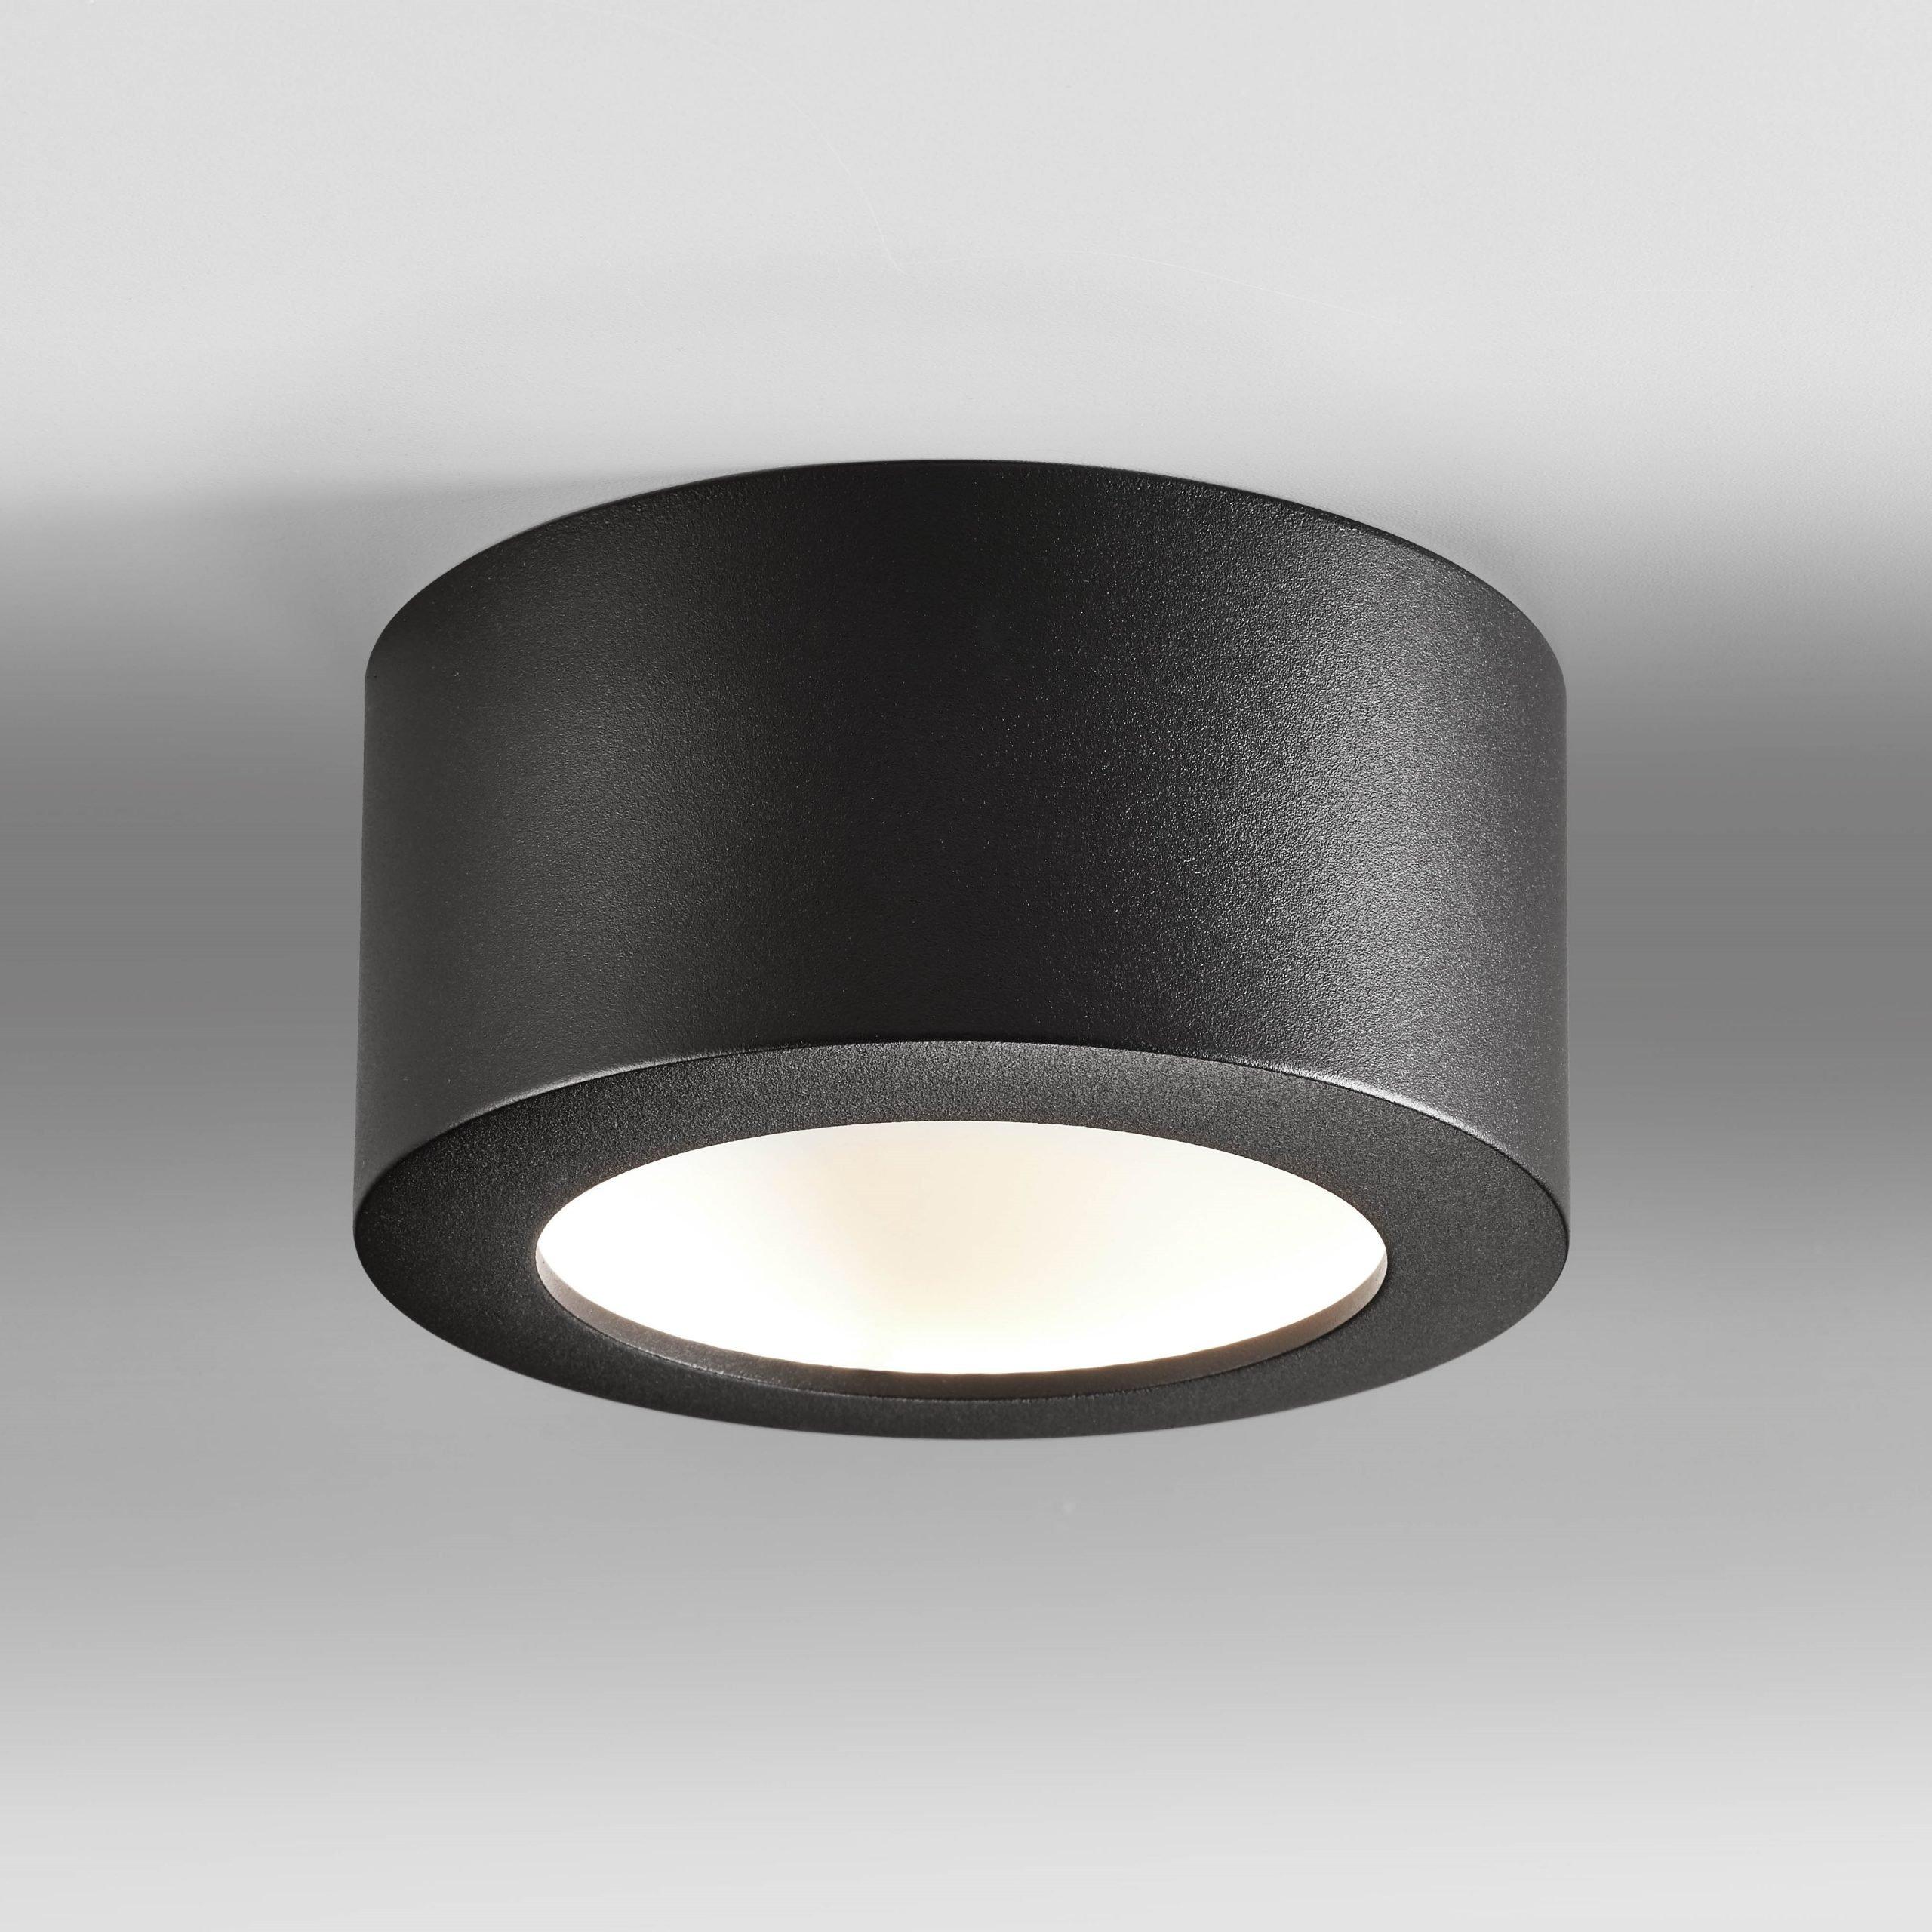 Plafondlamp Bowl Zwart Small